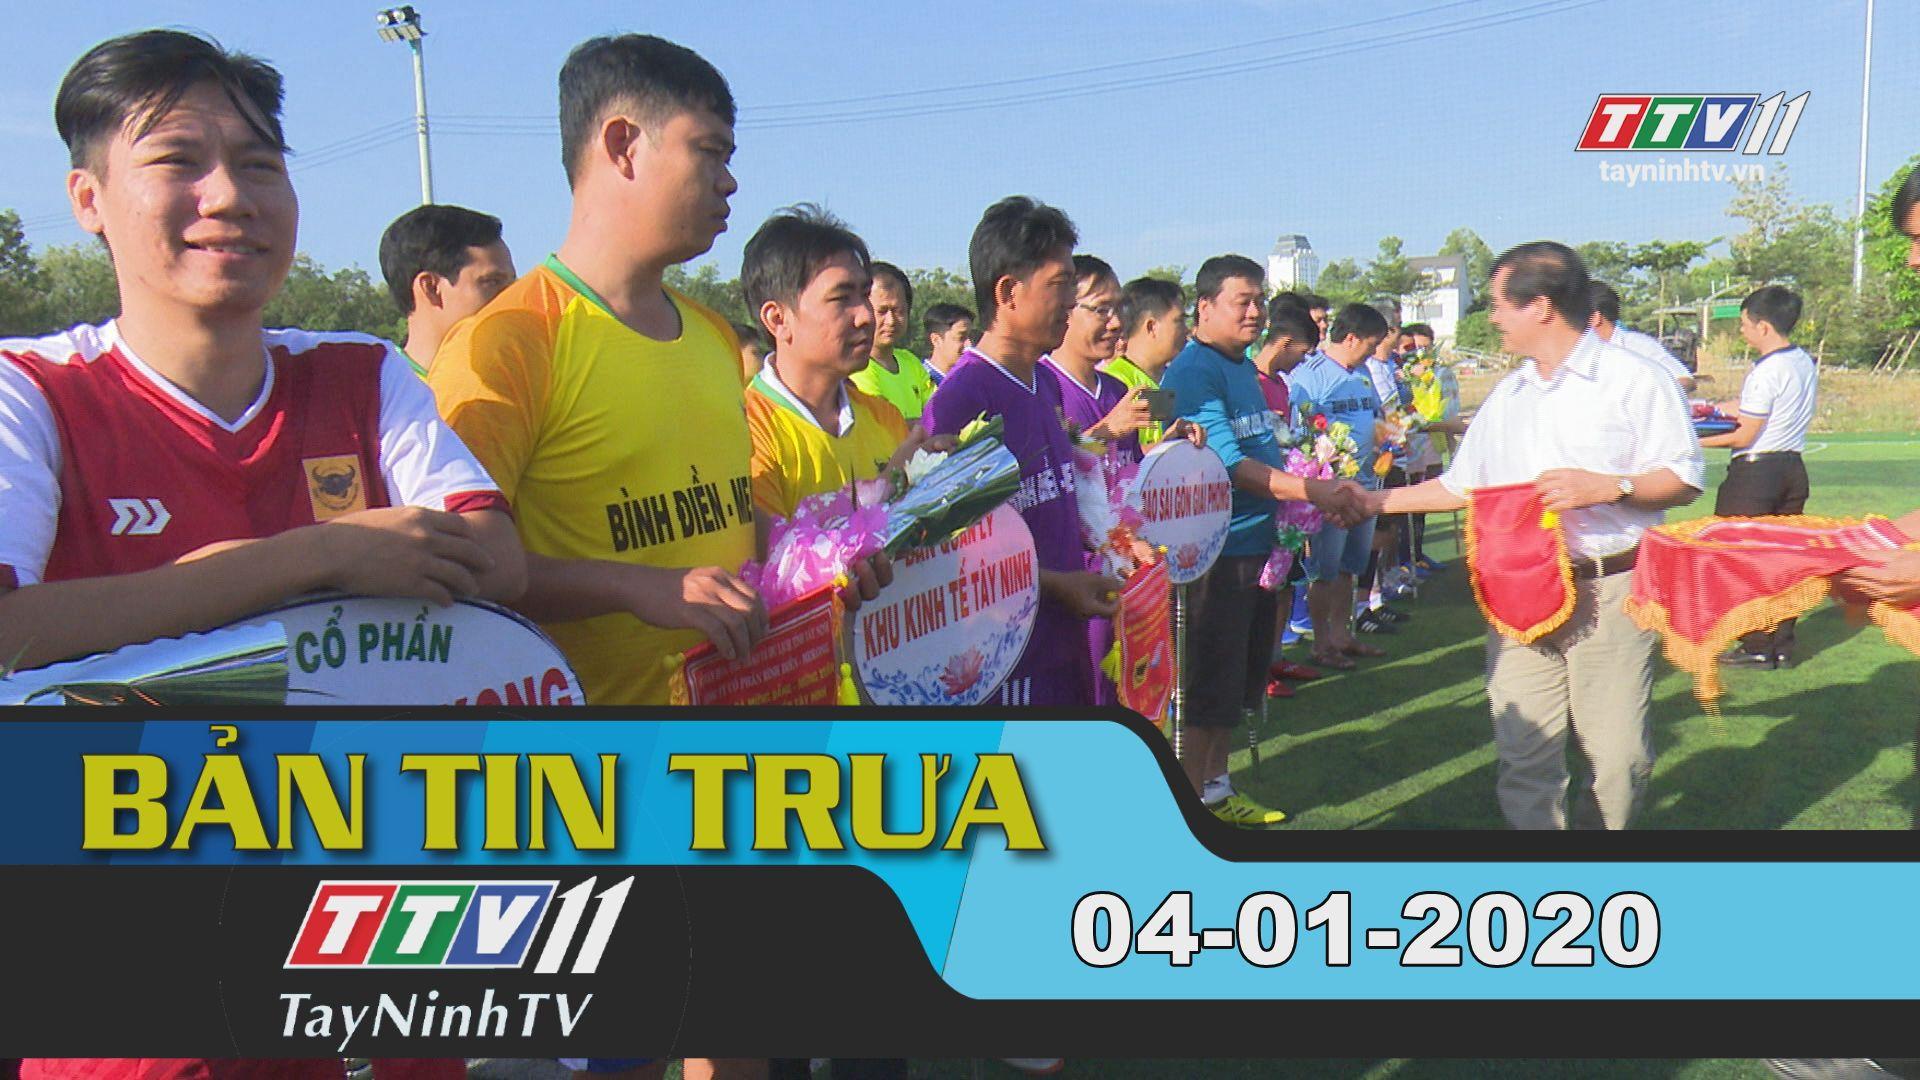 Bản tin trưa 04-01-2020 | Tin tức hôm nay | TayNinhTV